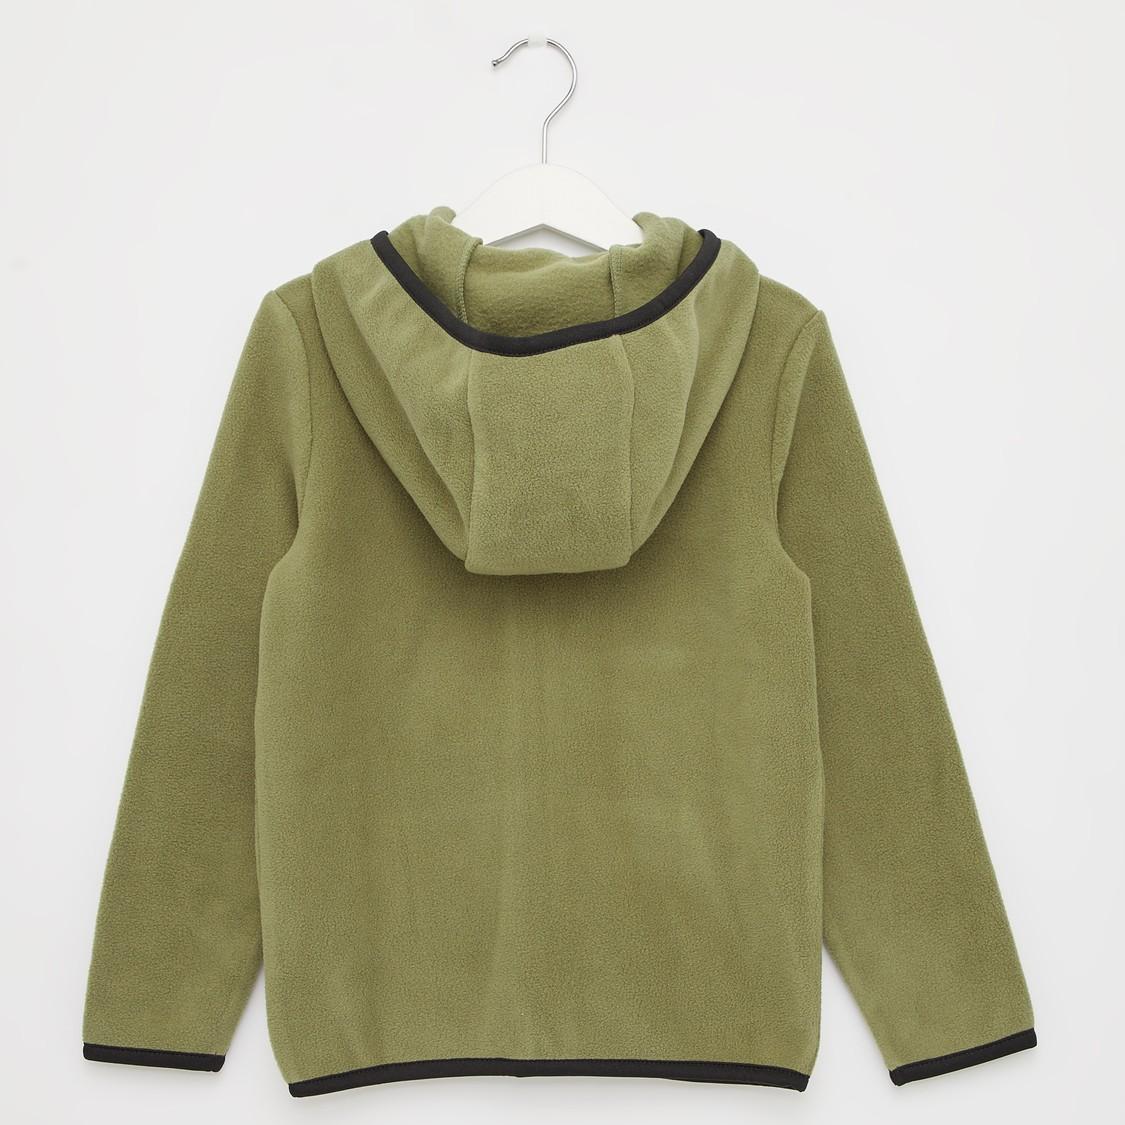 Embroidered Fleece Jacket with Long Sleeves and Hood